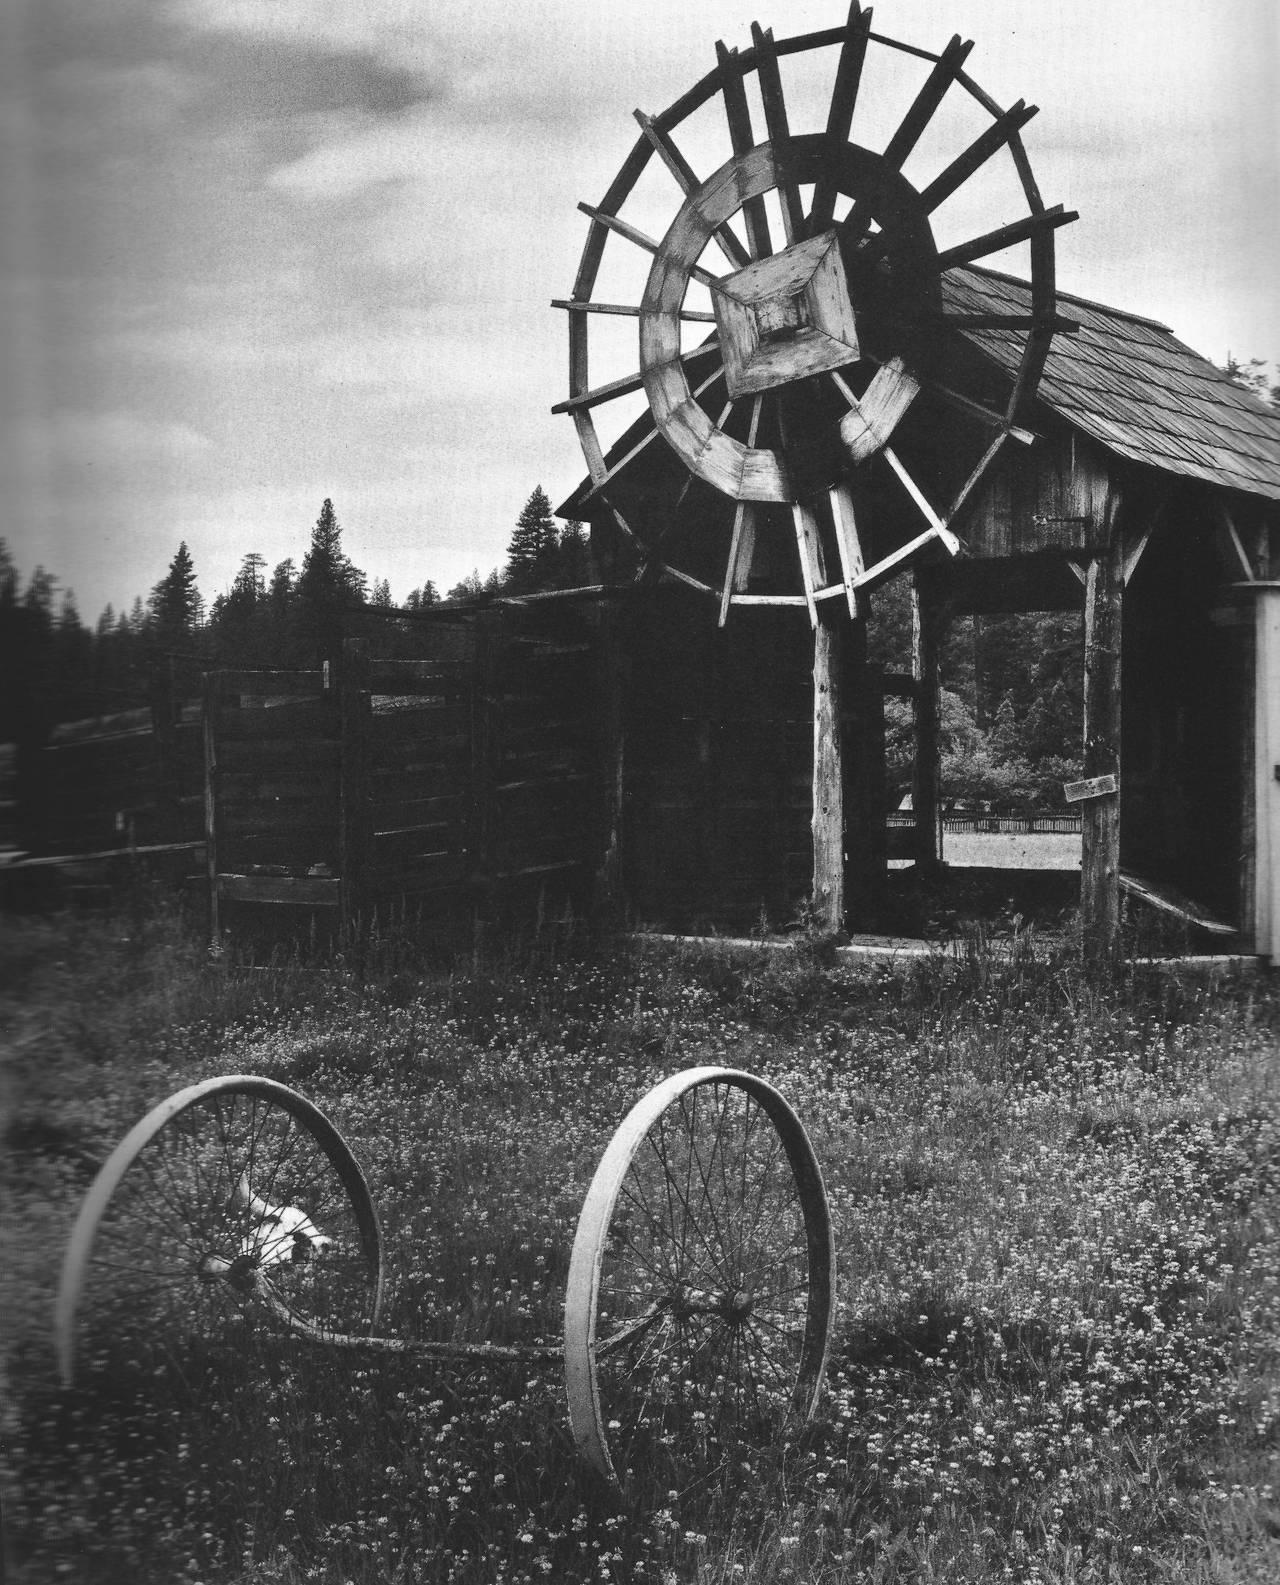 Edward Weston Black and White Photograph - Meyer's Ranch, Yosemite